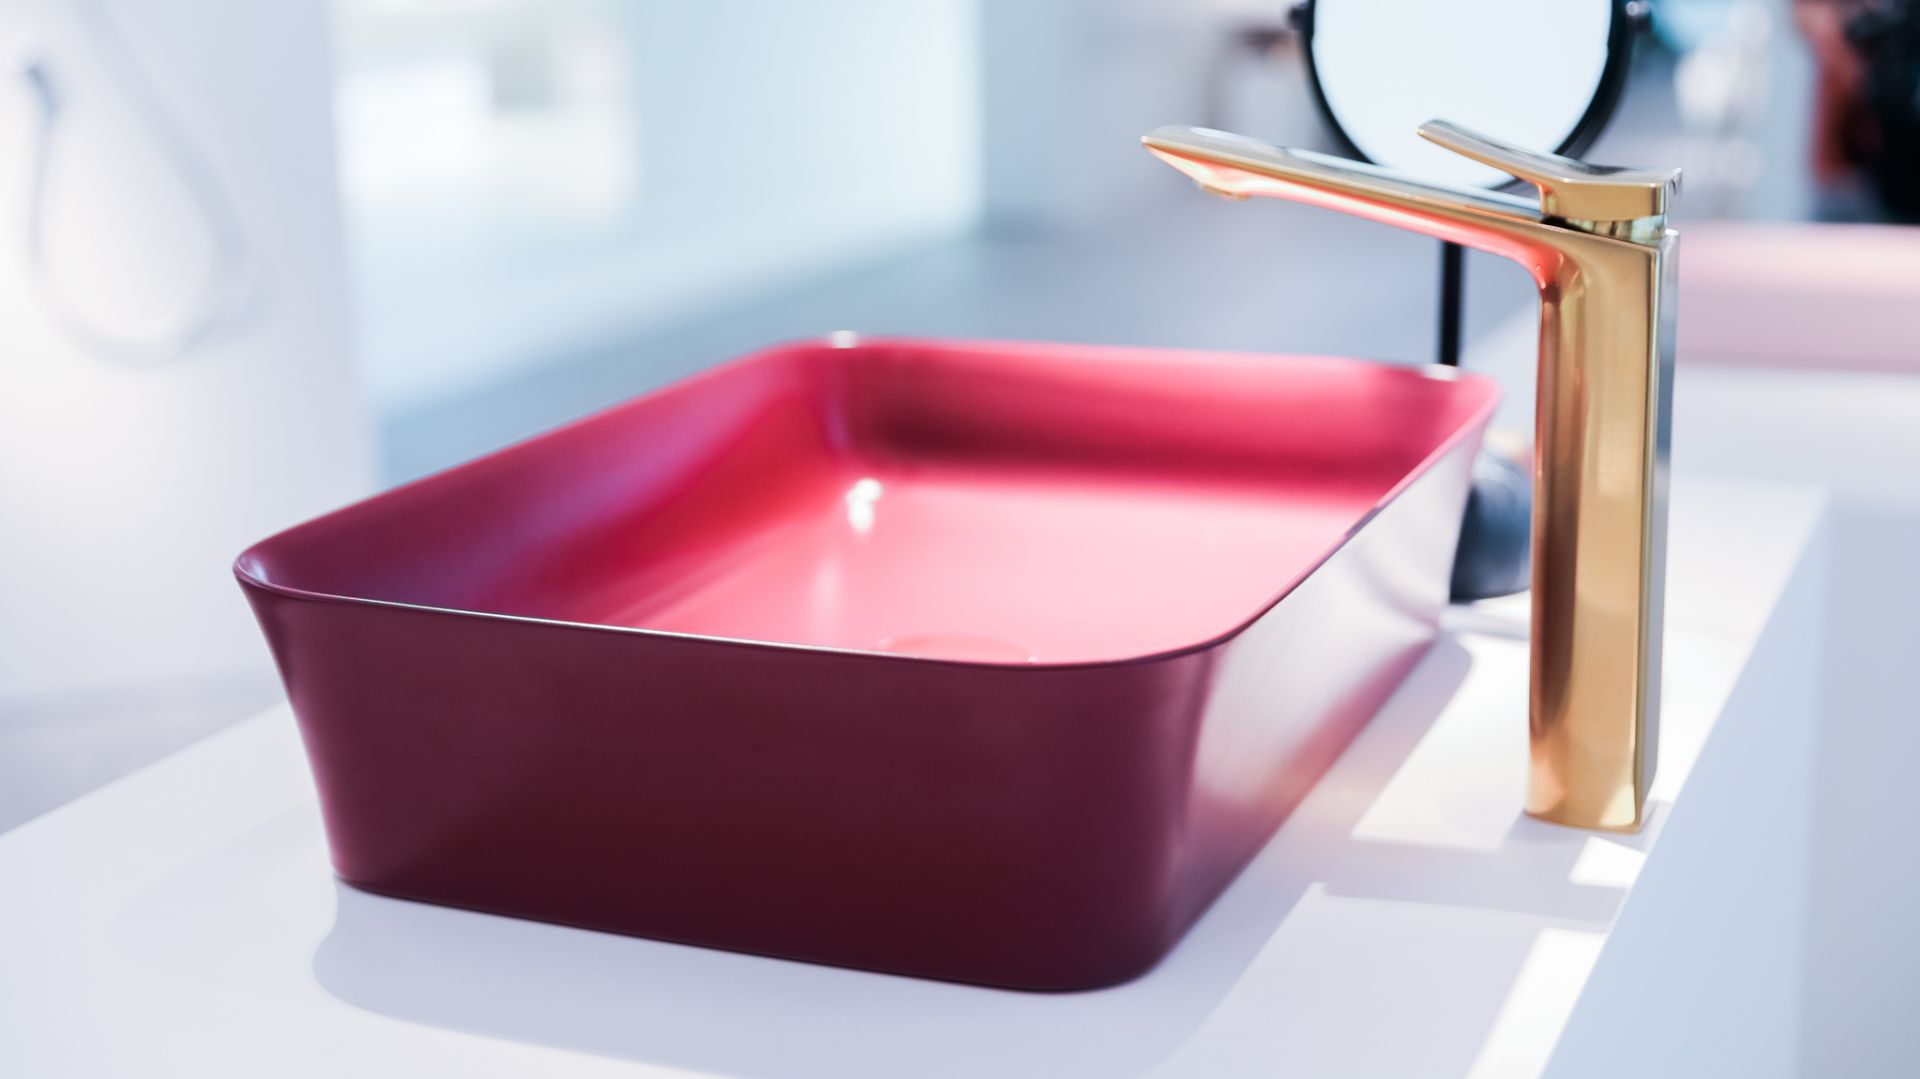 Umywalka Ipalyss w kolorze pomegranate. Fot. Ideal Standard